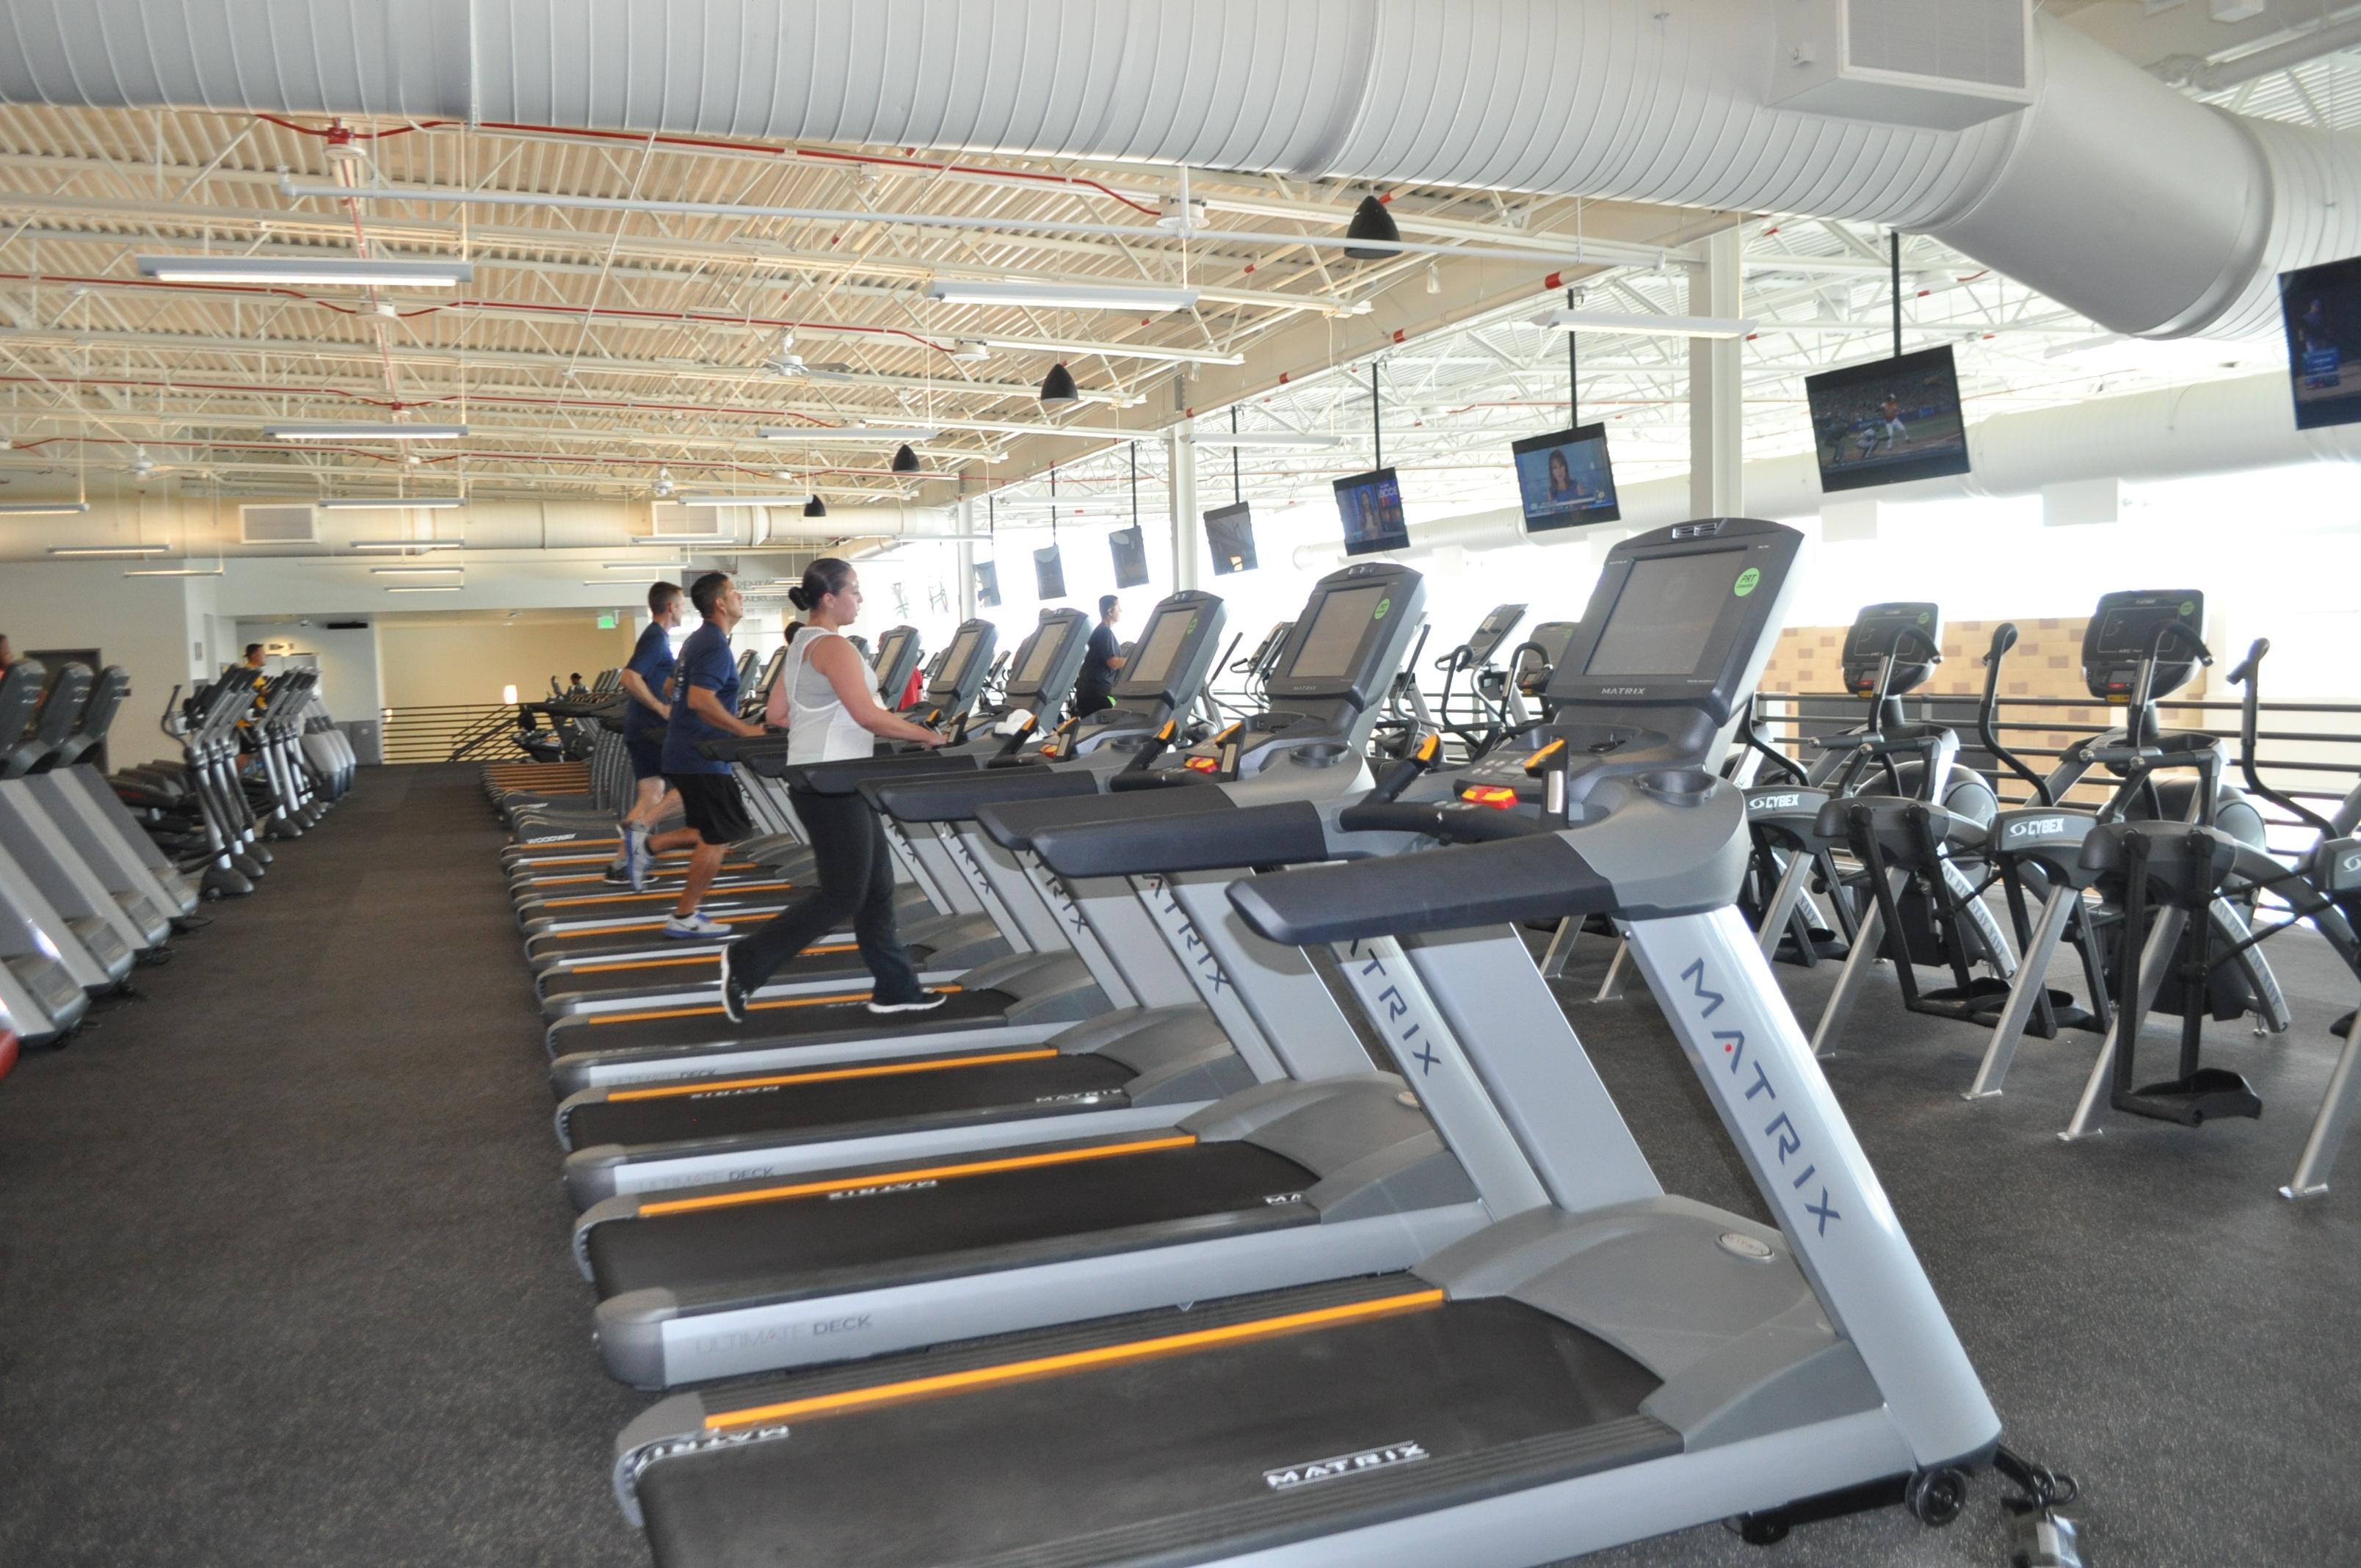 Navy Base North Island Gym